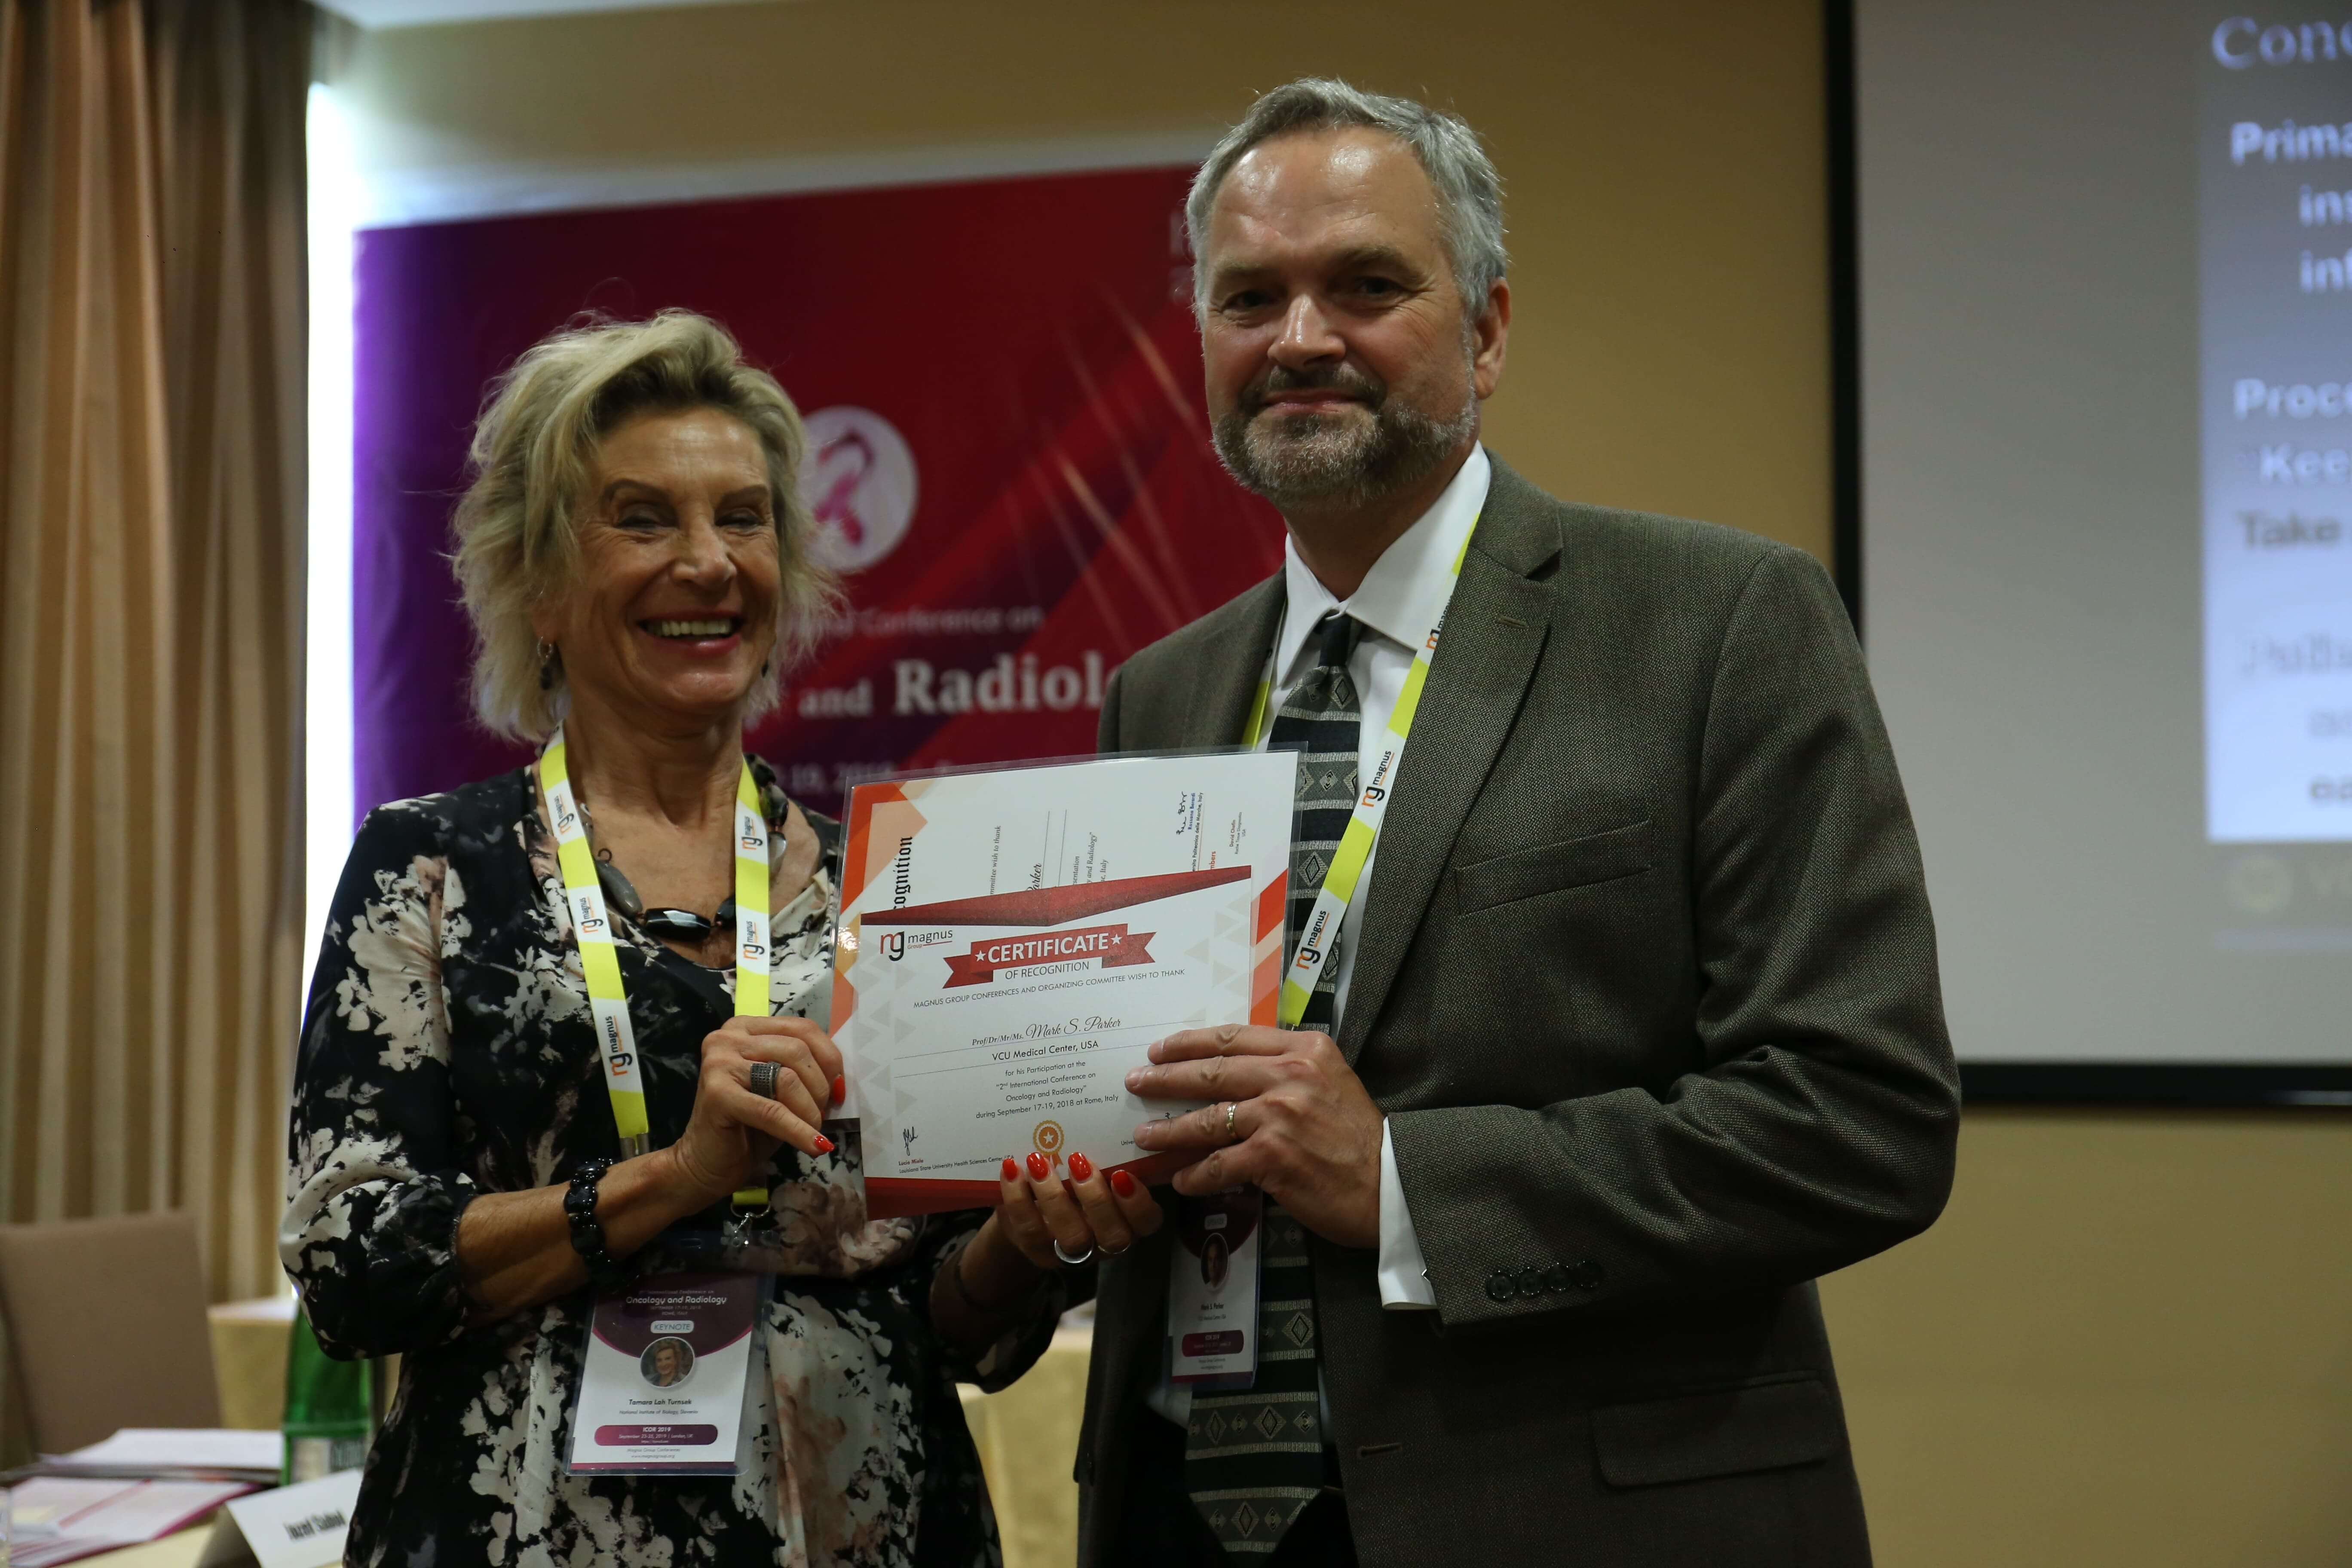 Cancer education conferences - Mark S. Parker